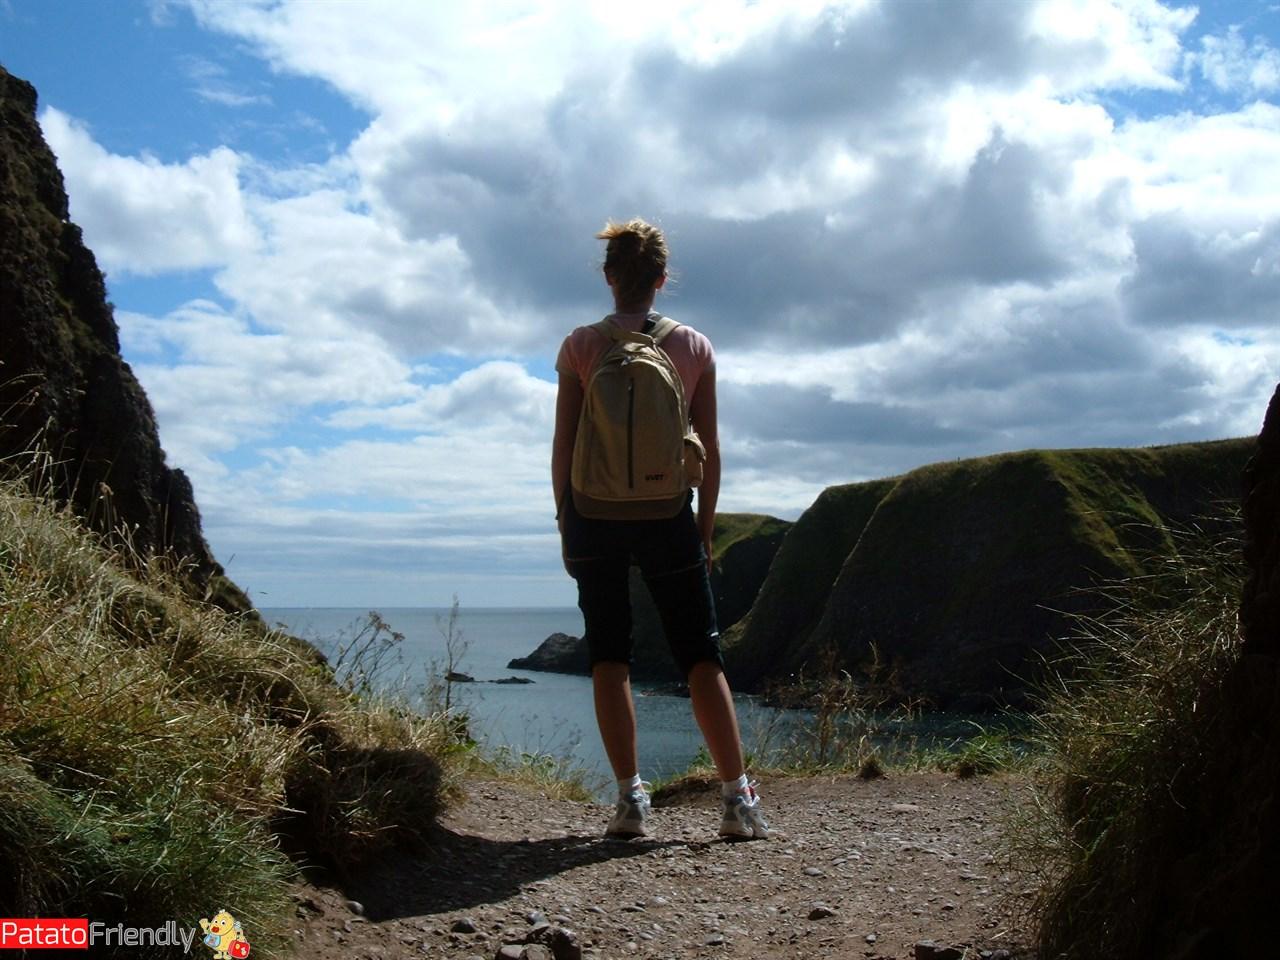 [cml_media_alt id='15532']Cosa vedere in Scozia - Dunottar Castle[/cml_media_alt]